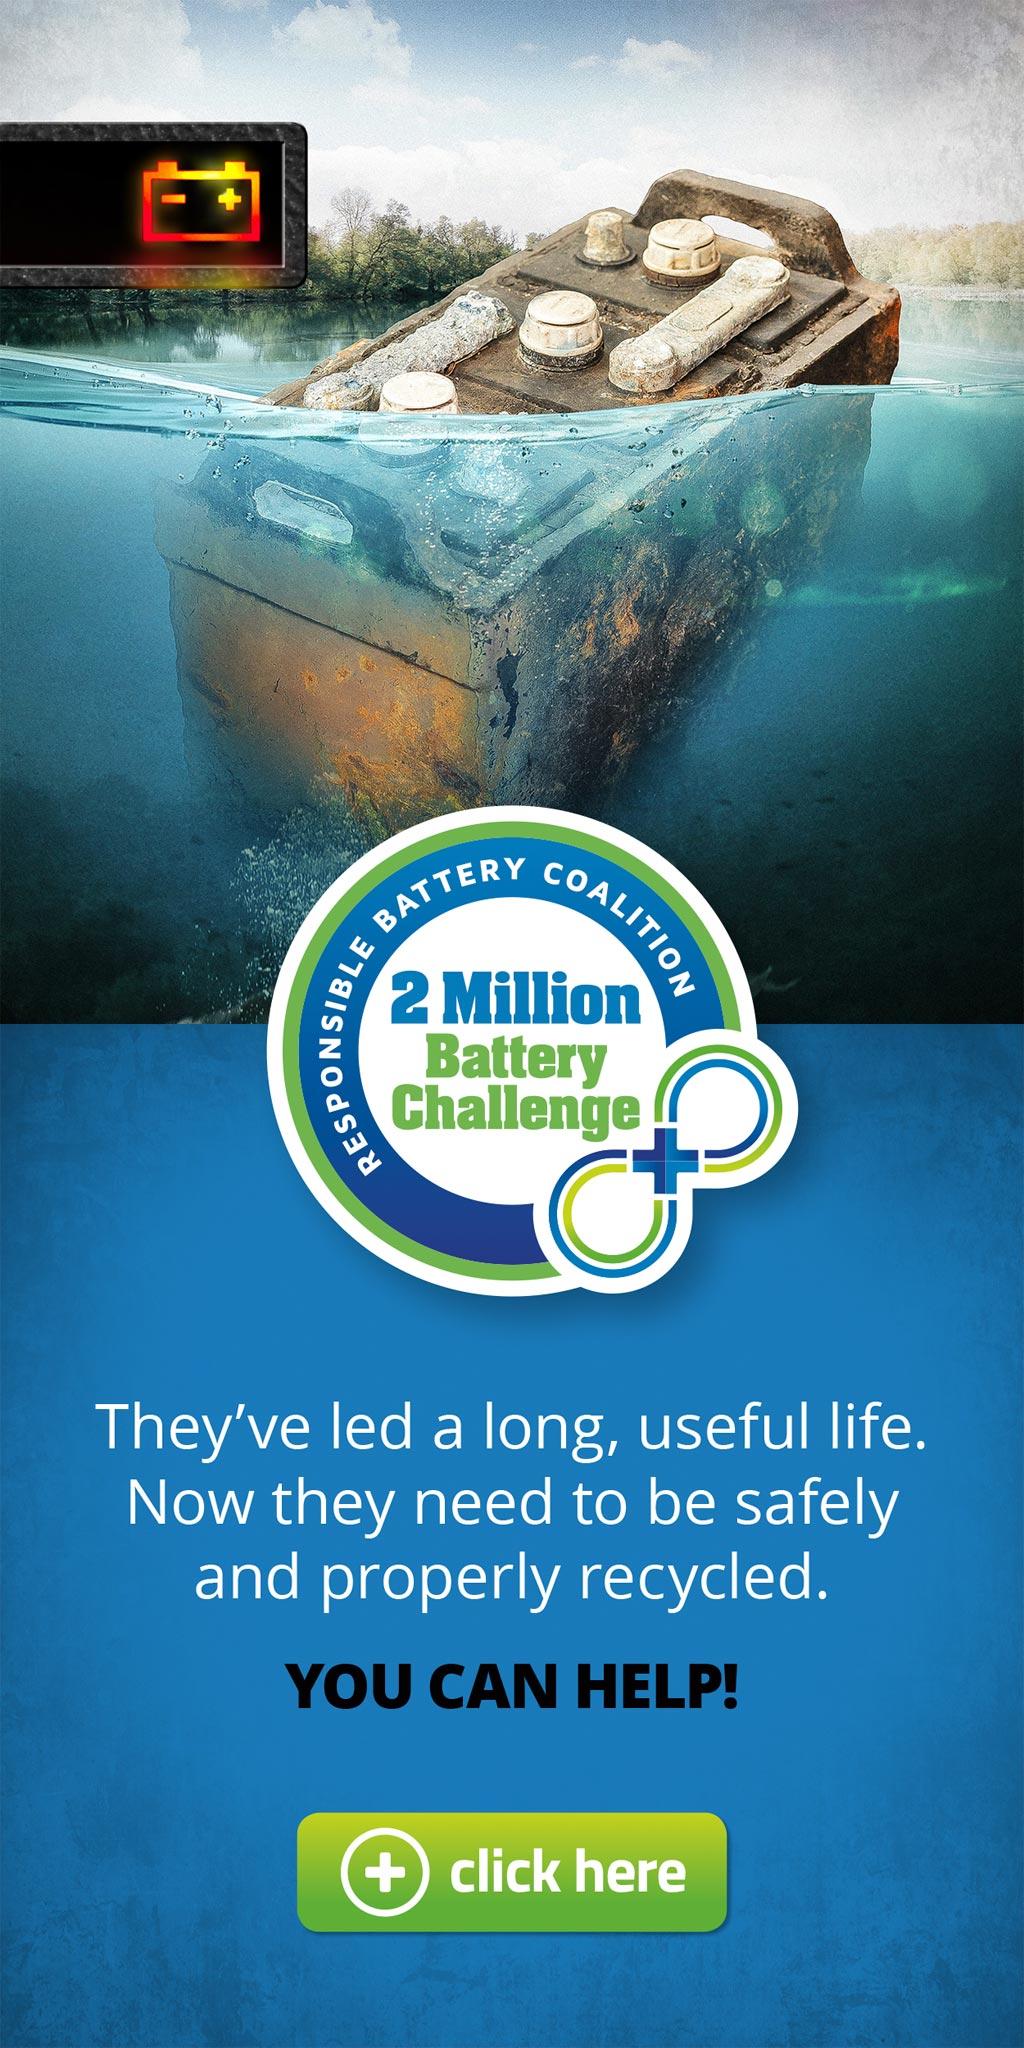 Responsible Battery Coalition, 2 Million Battery Challenge Digital Ad